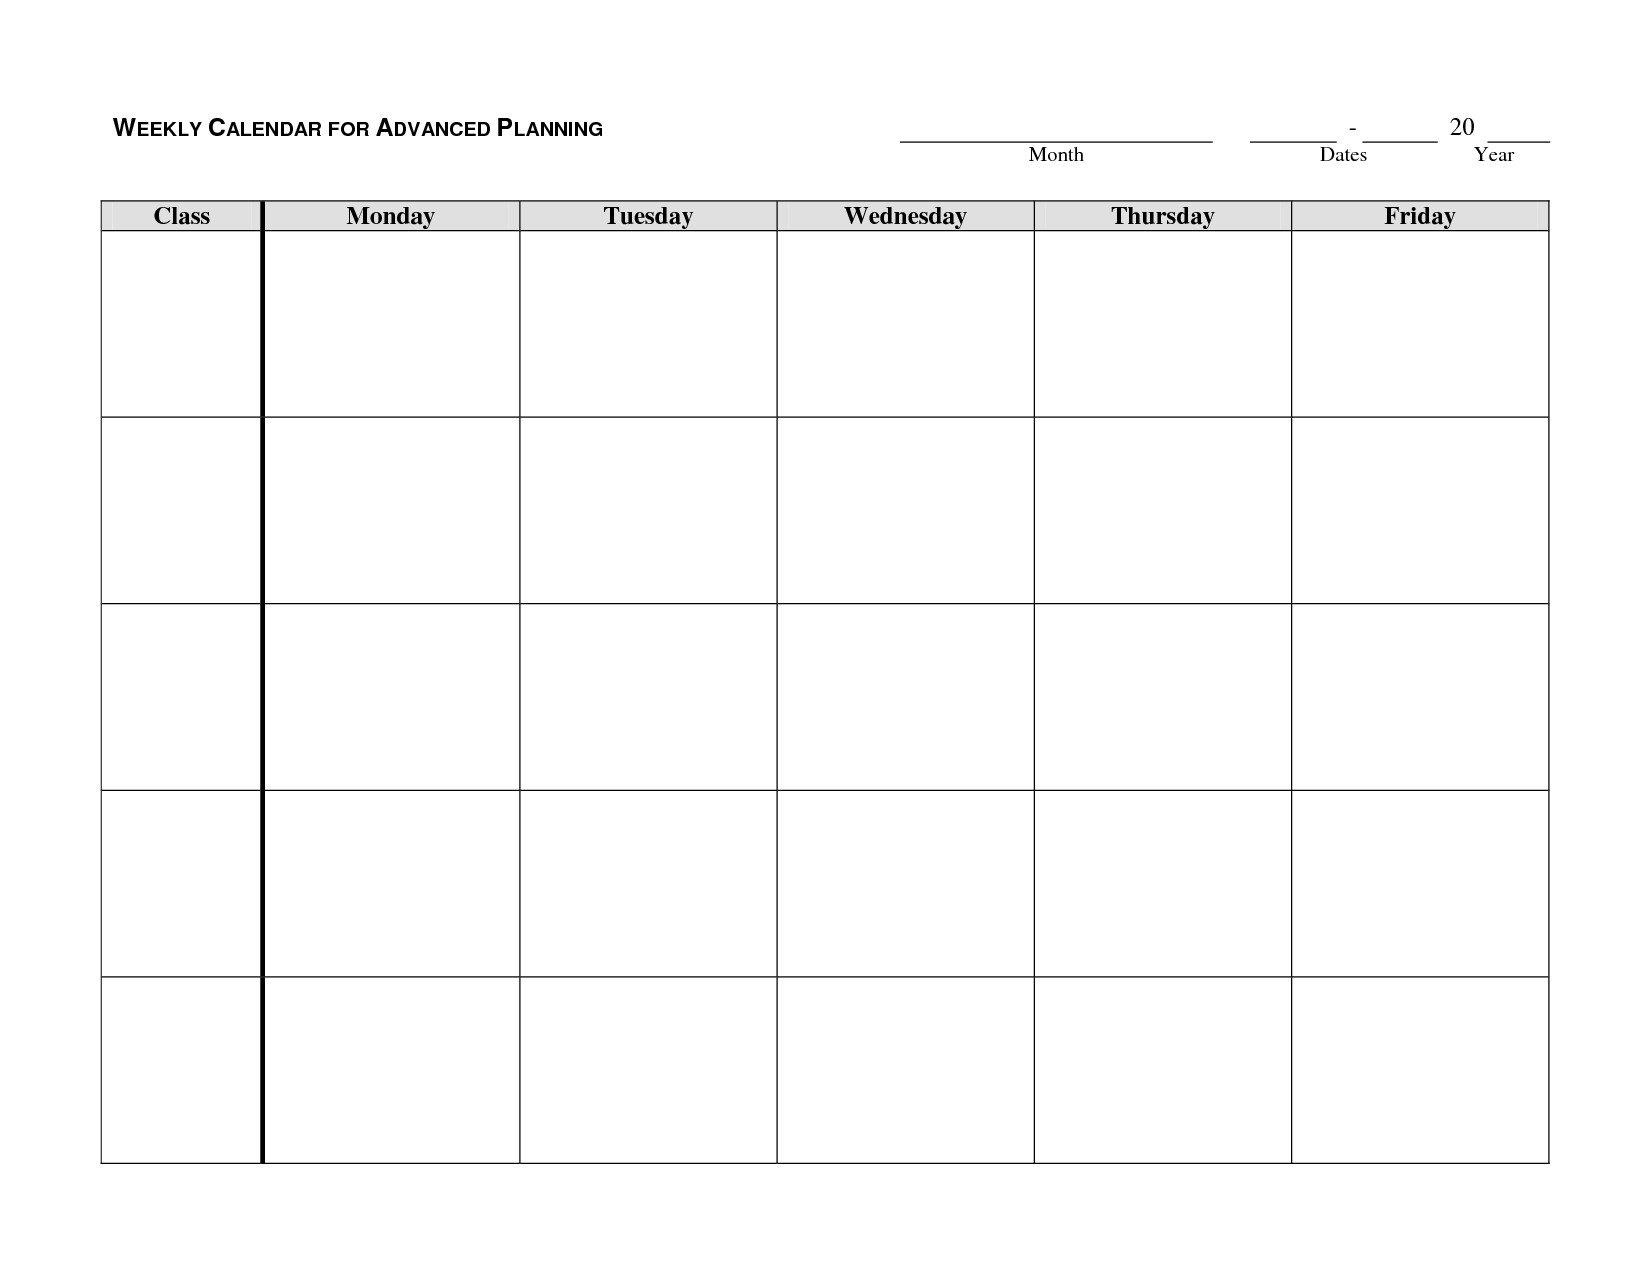 Week Template Monday Through Friday - Calendar Inspiration Mon Thru Fri Weekly Planner Printable